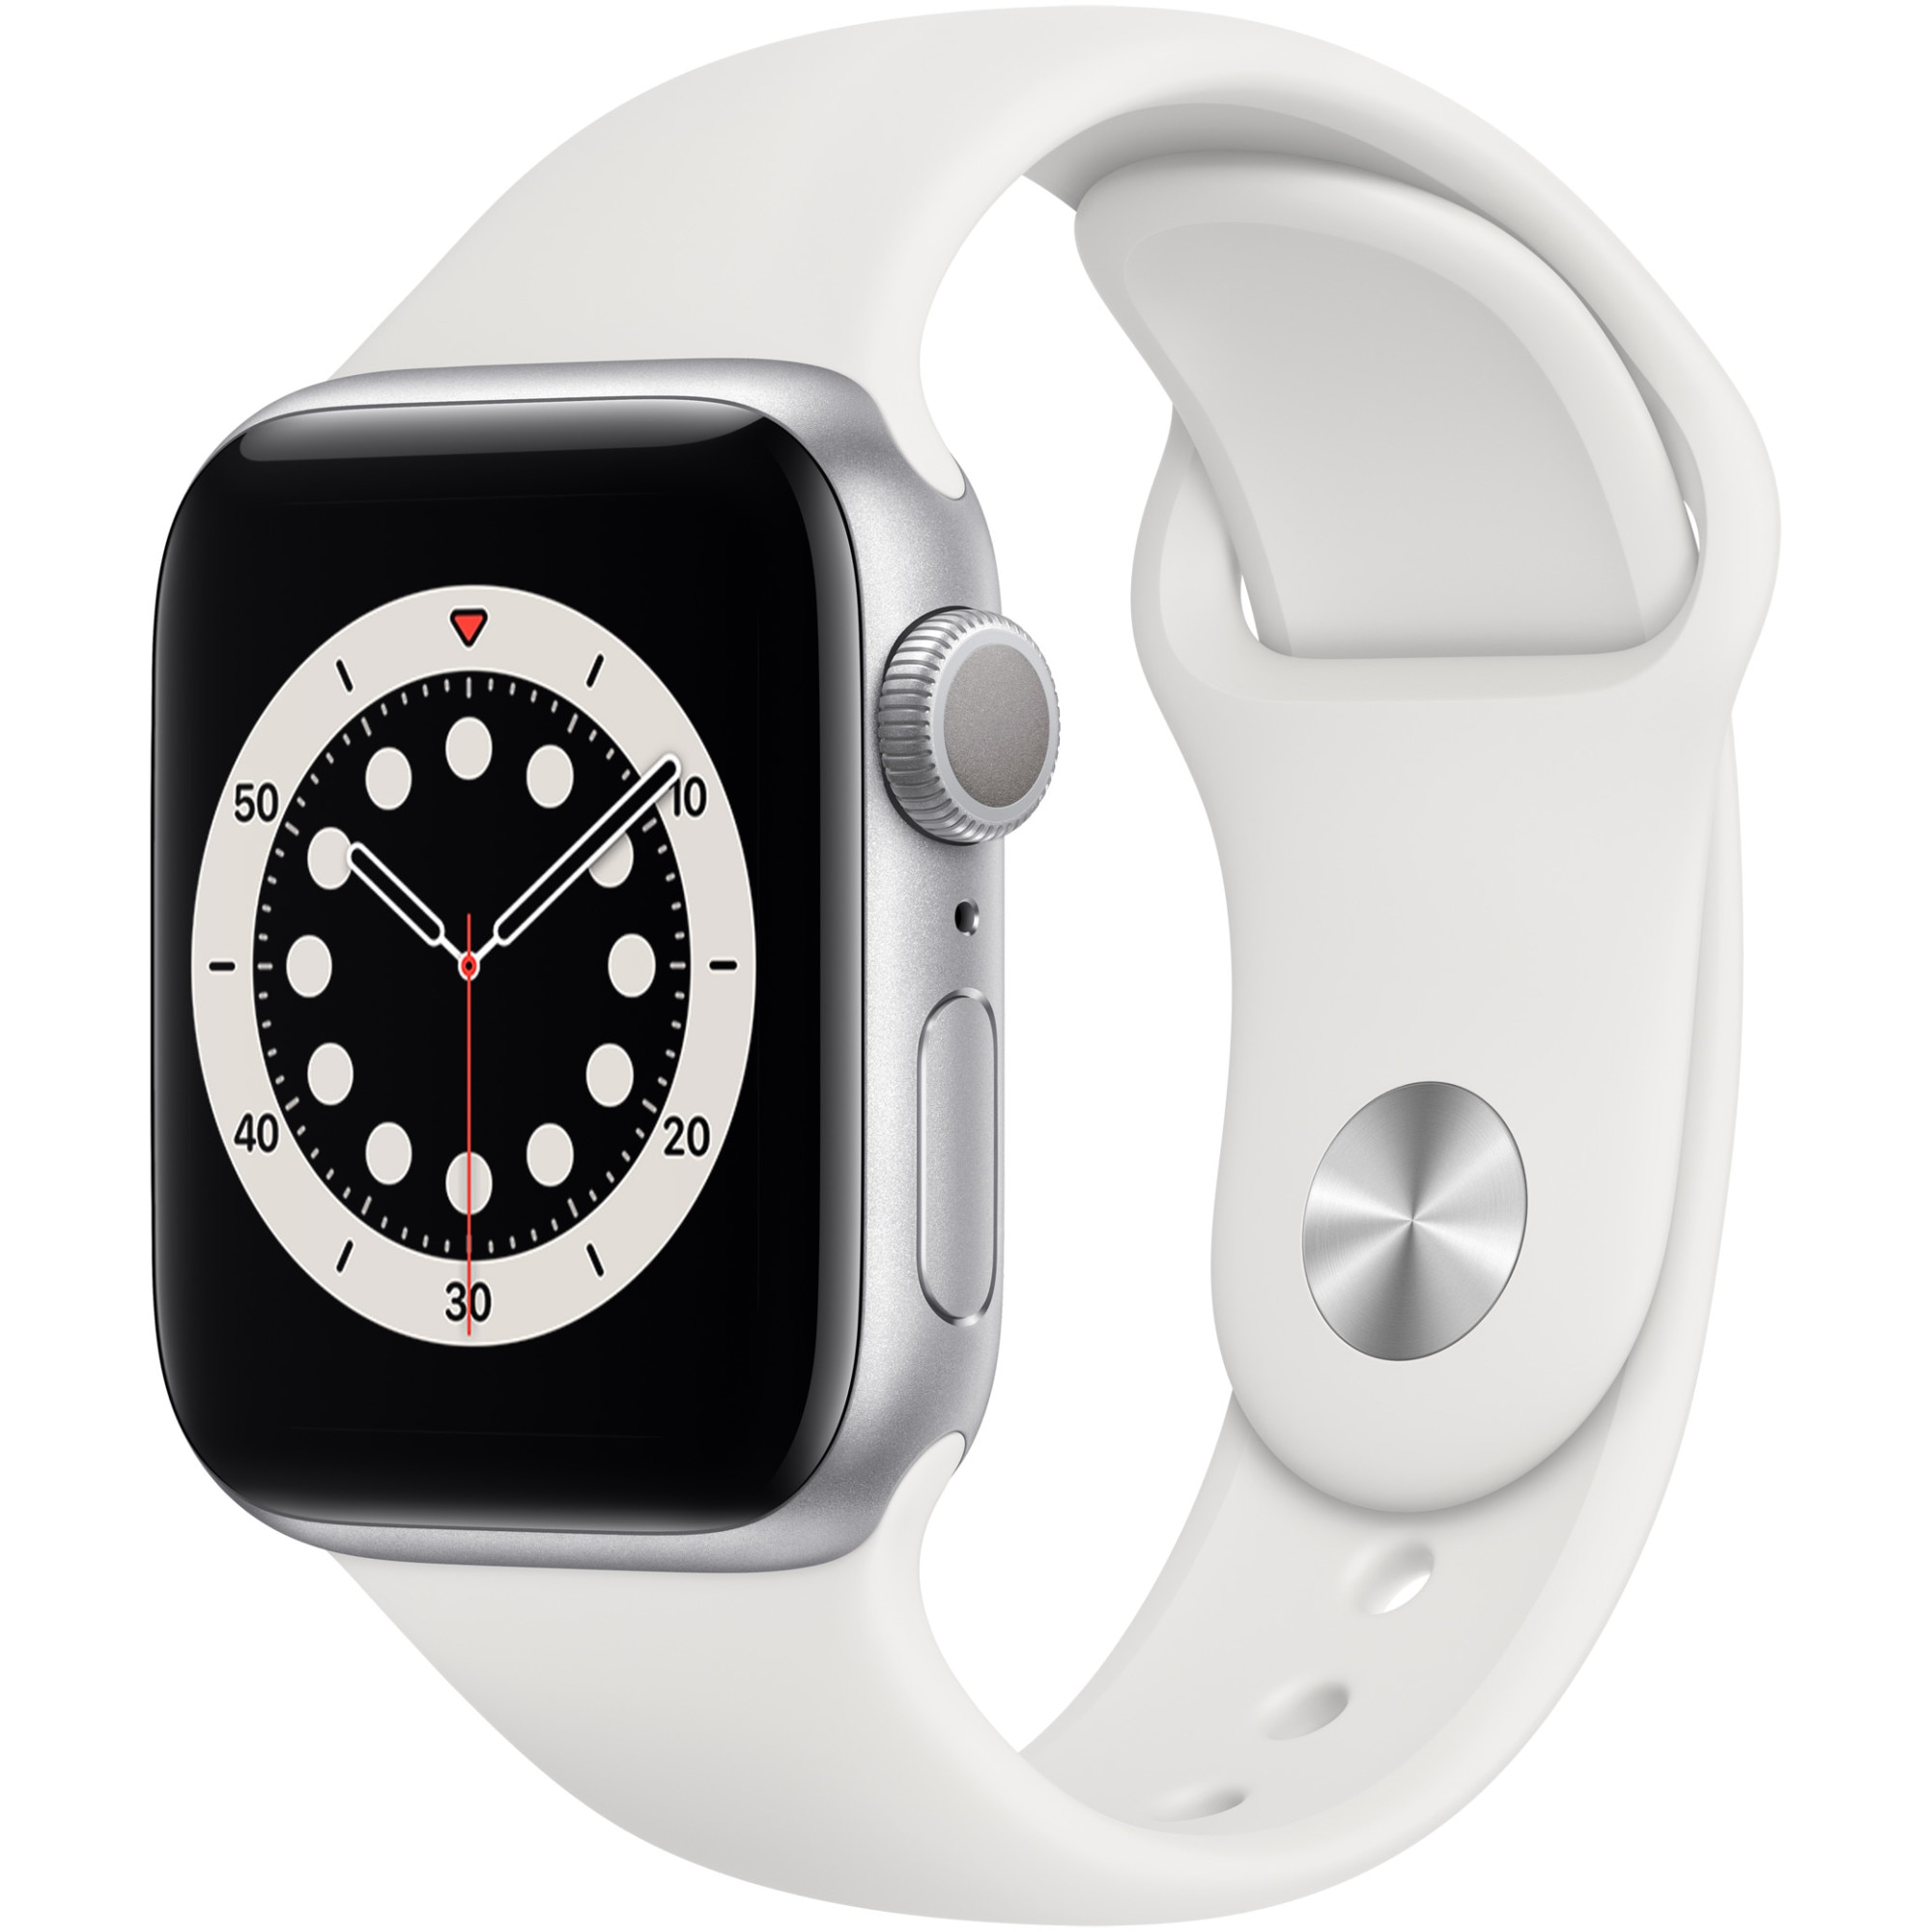 Fotografie Apple Watch 6, GPS, Carcasa Silver Aluminium 40mm, White Sport Band